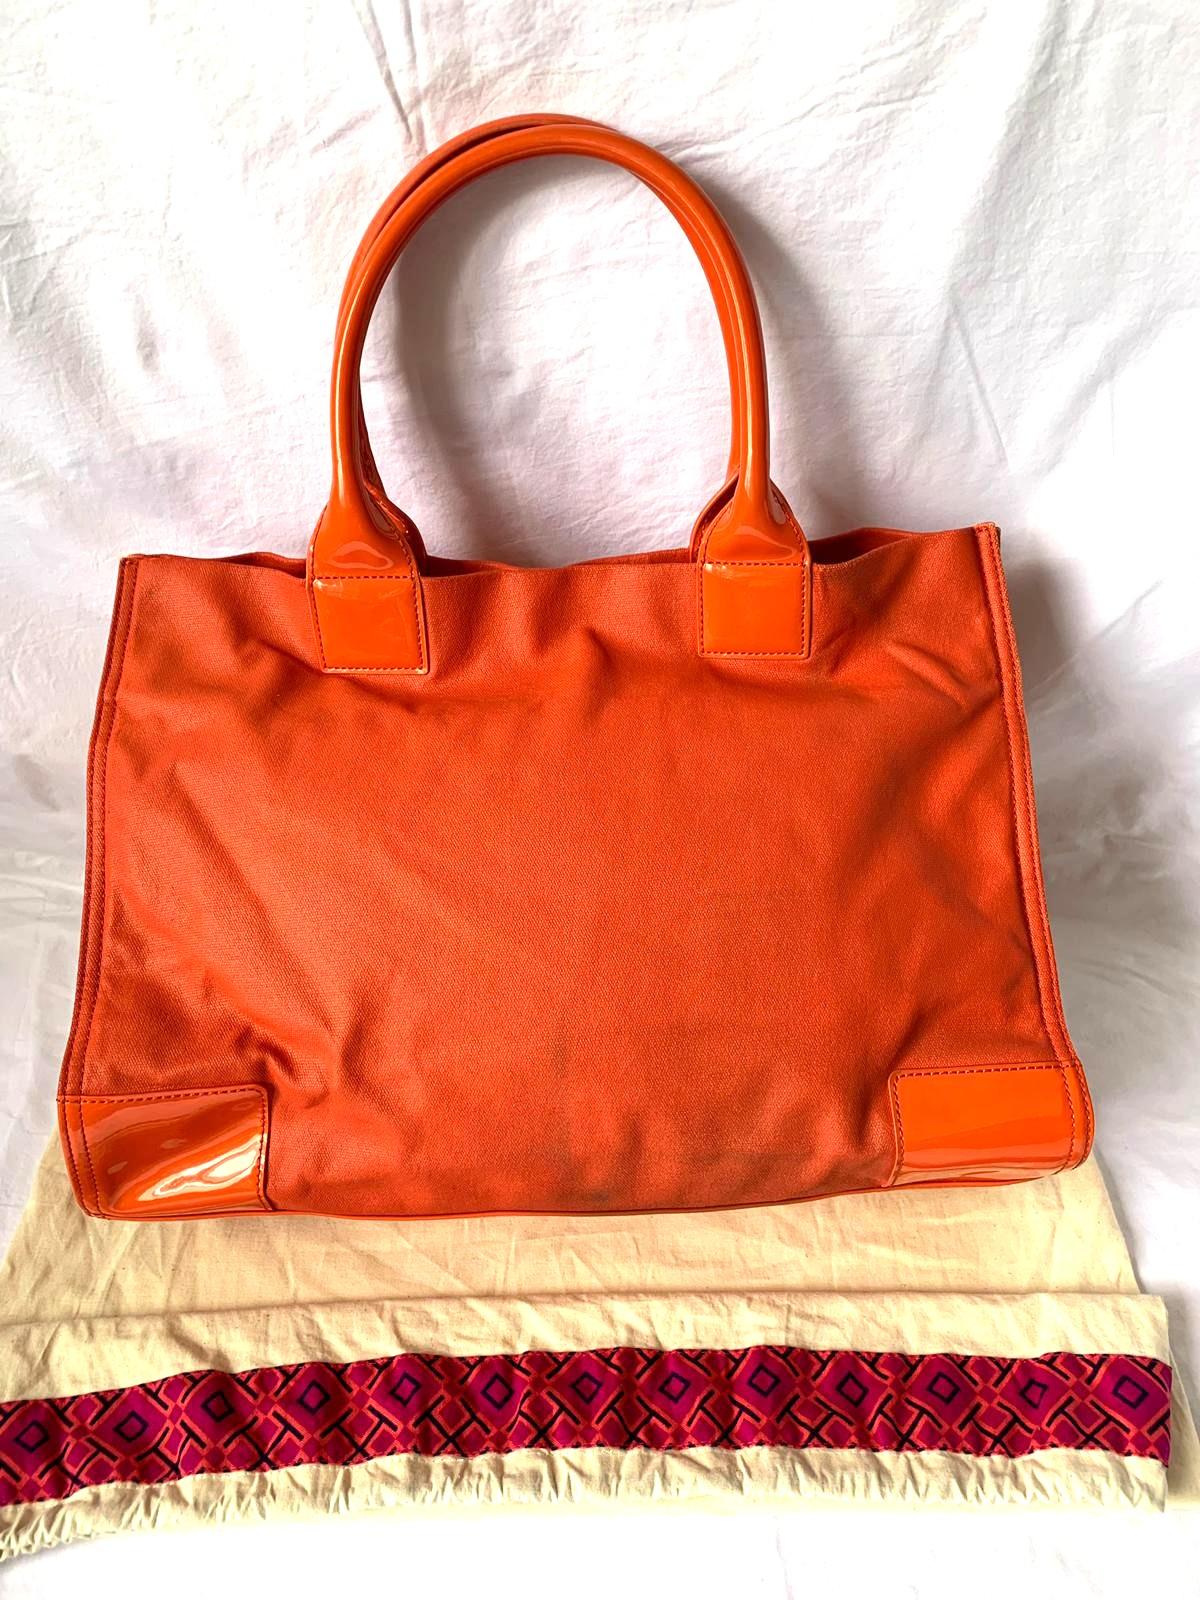 b6ee2608be56 Tory Burch Tote Bag